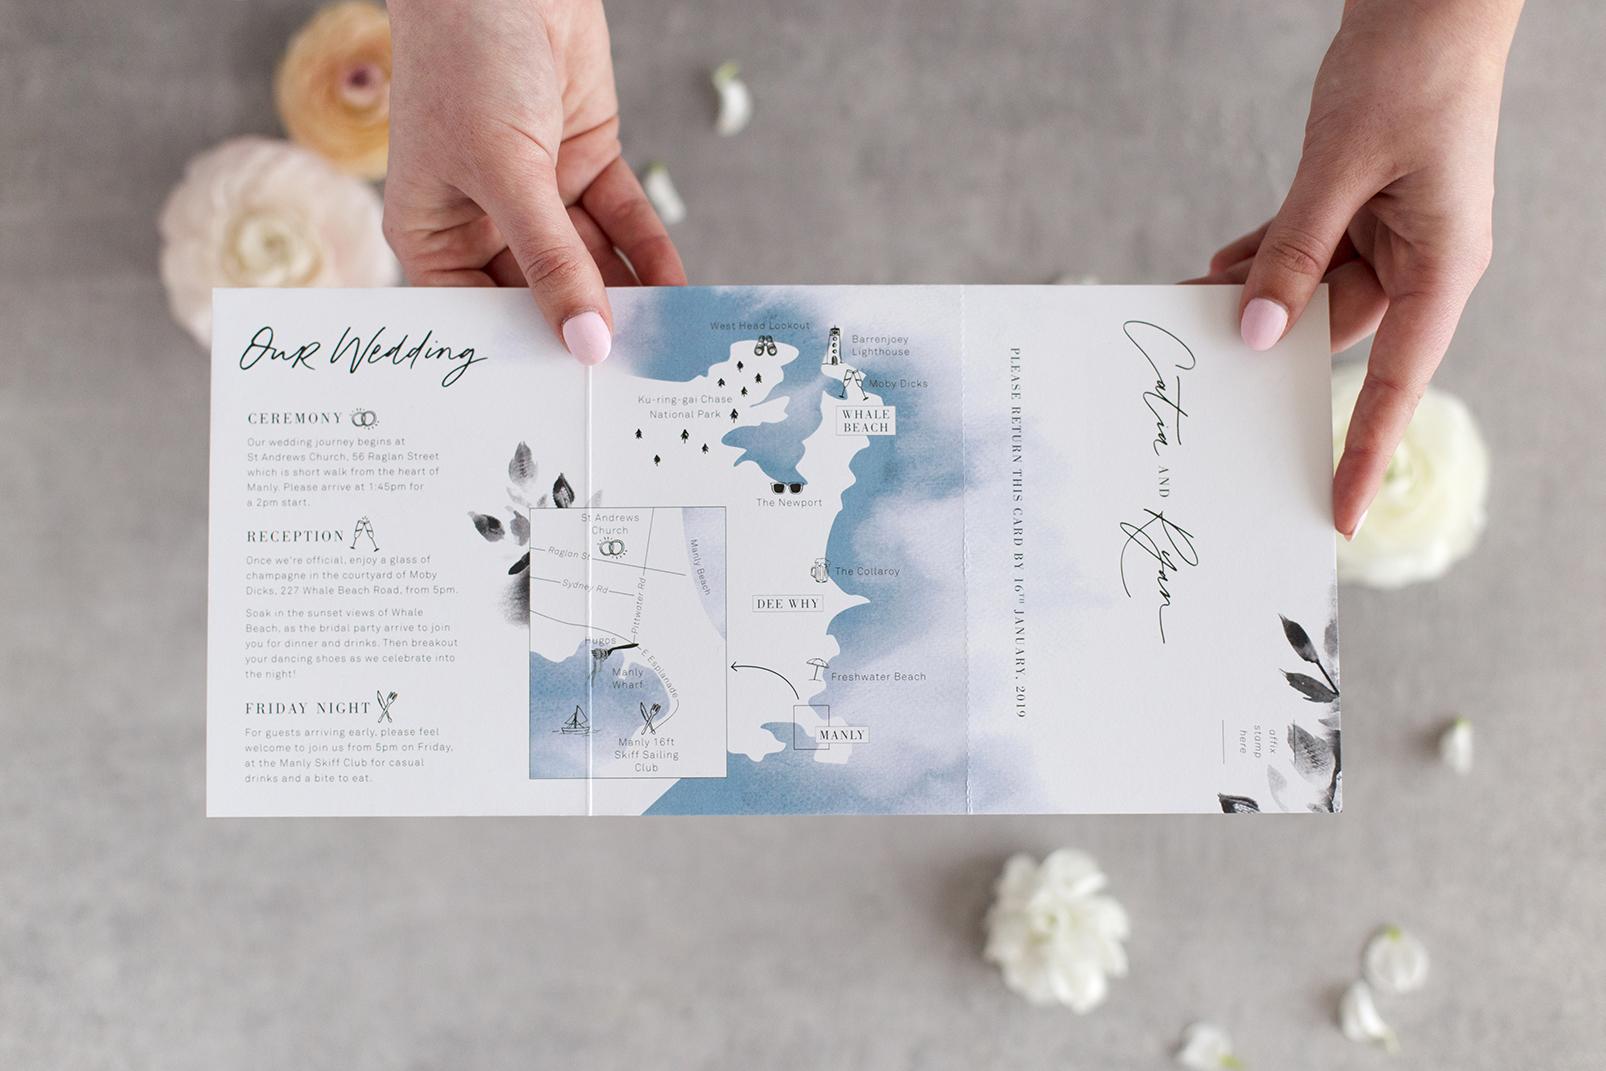 better-together-paper-wedding-invitation-palomino-4.jpg